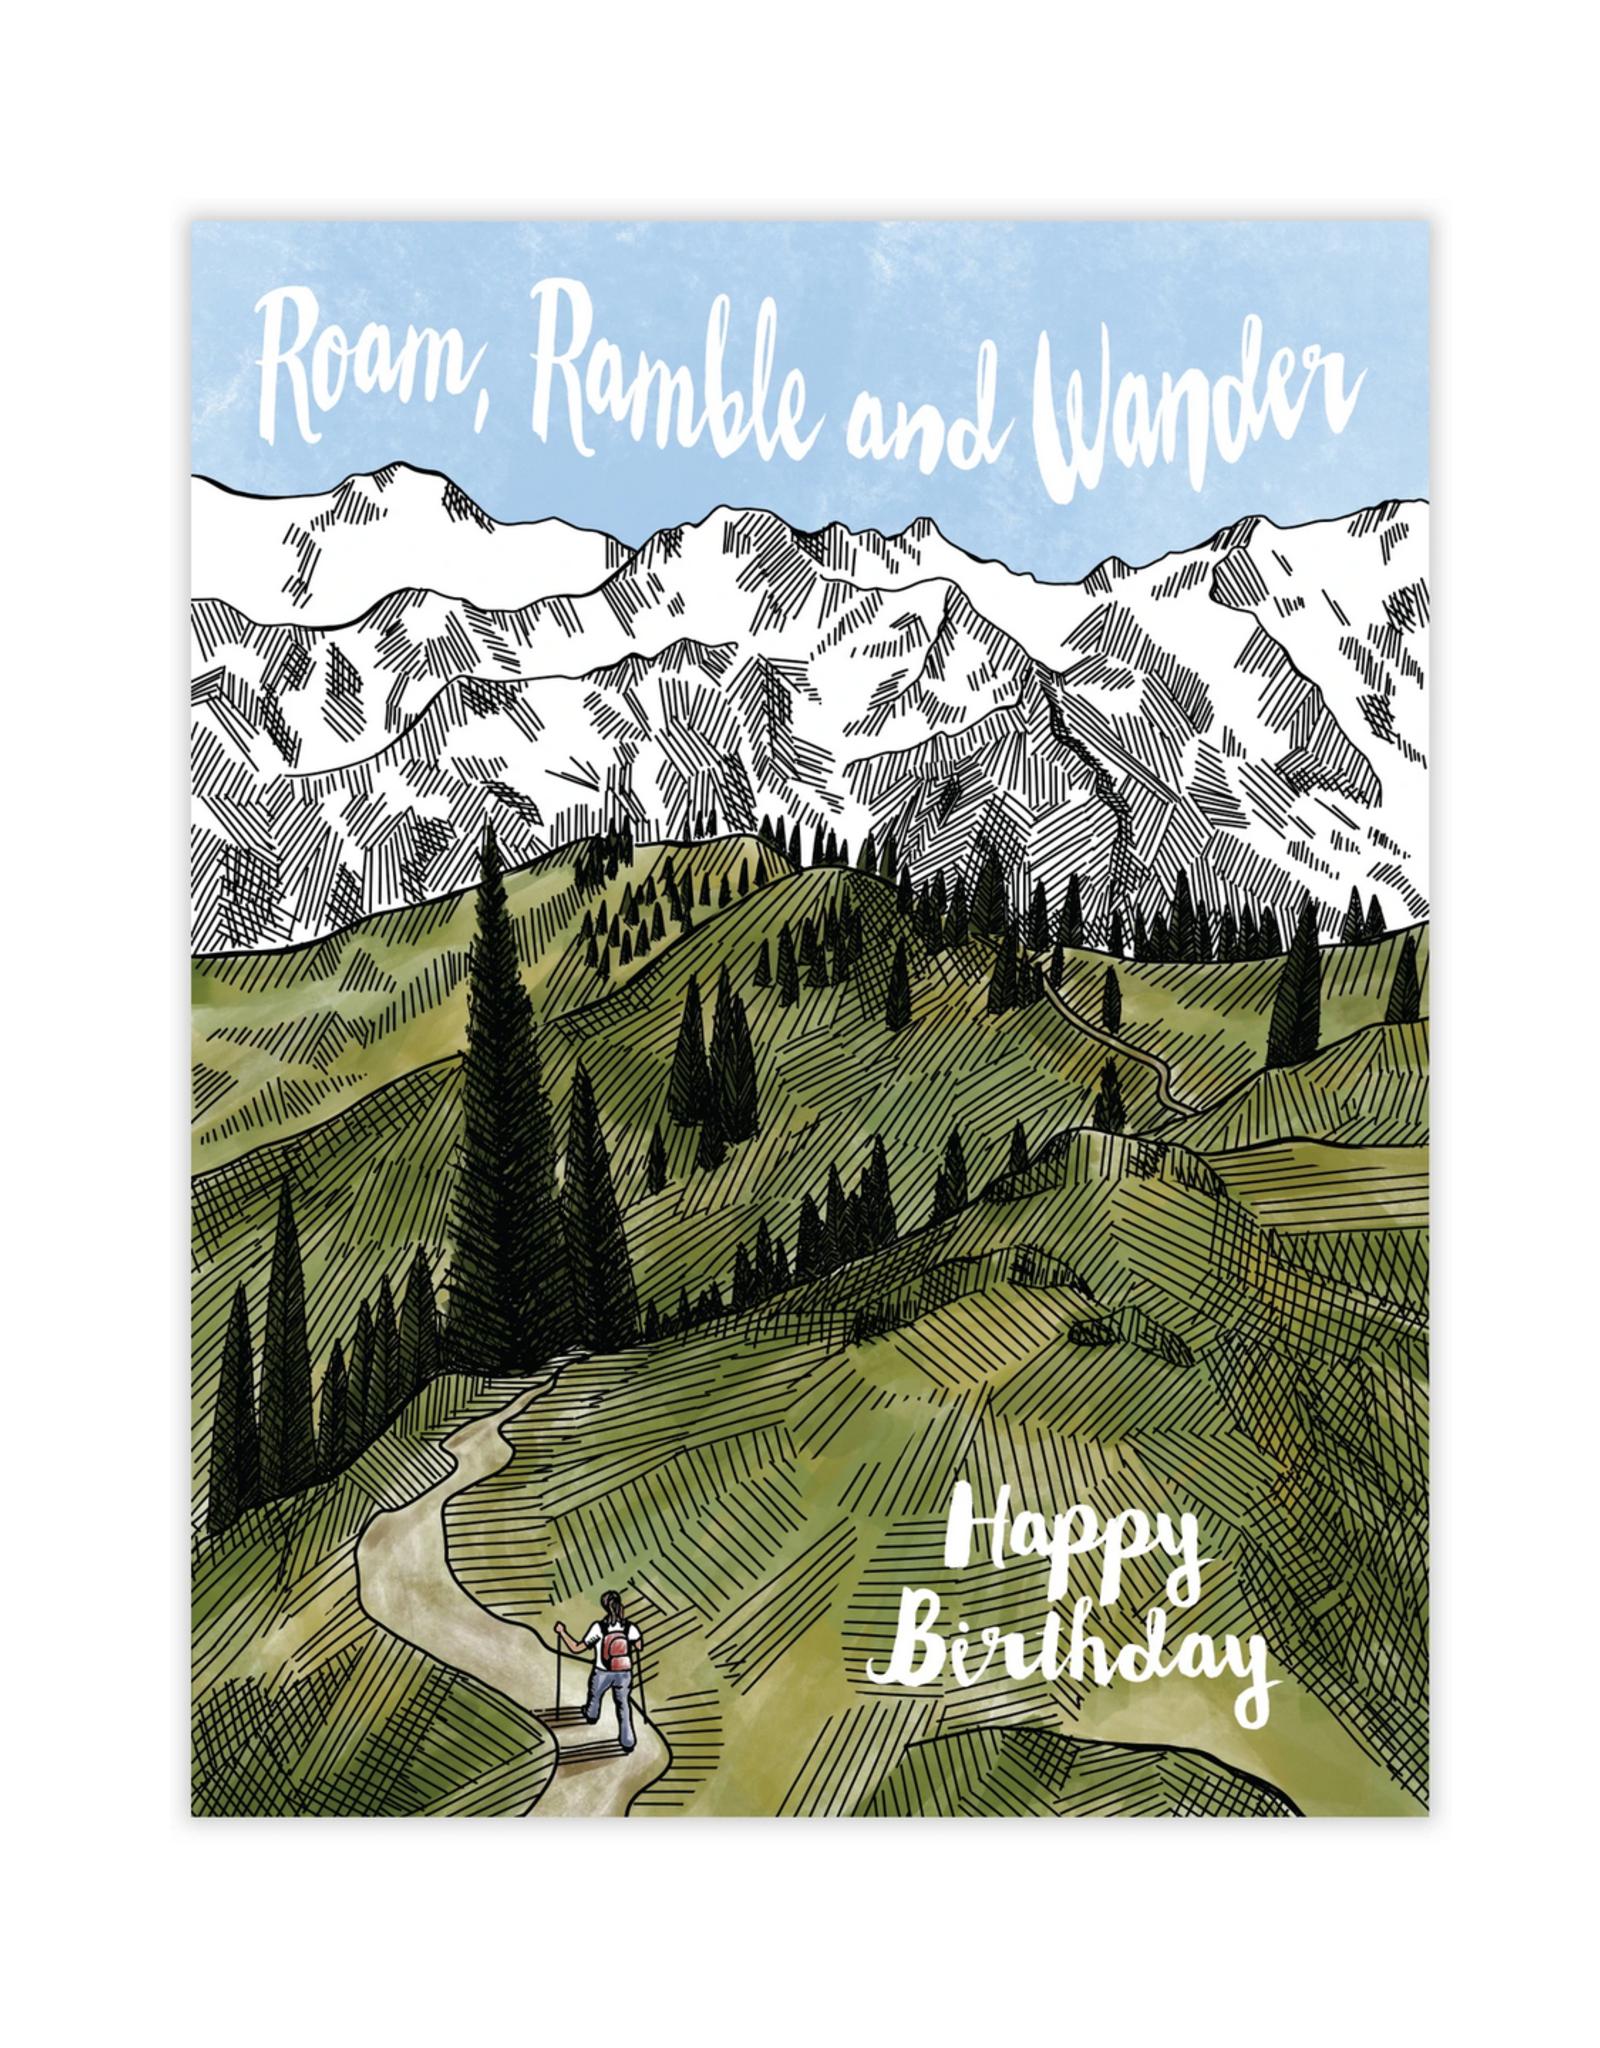 Waterknot Roam, Ramble, Wander. Happy Birthday Greeting Card